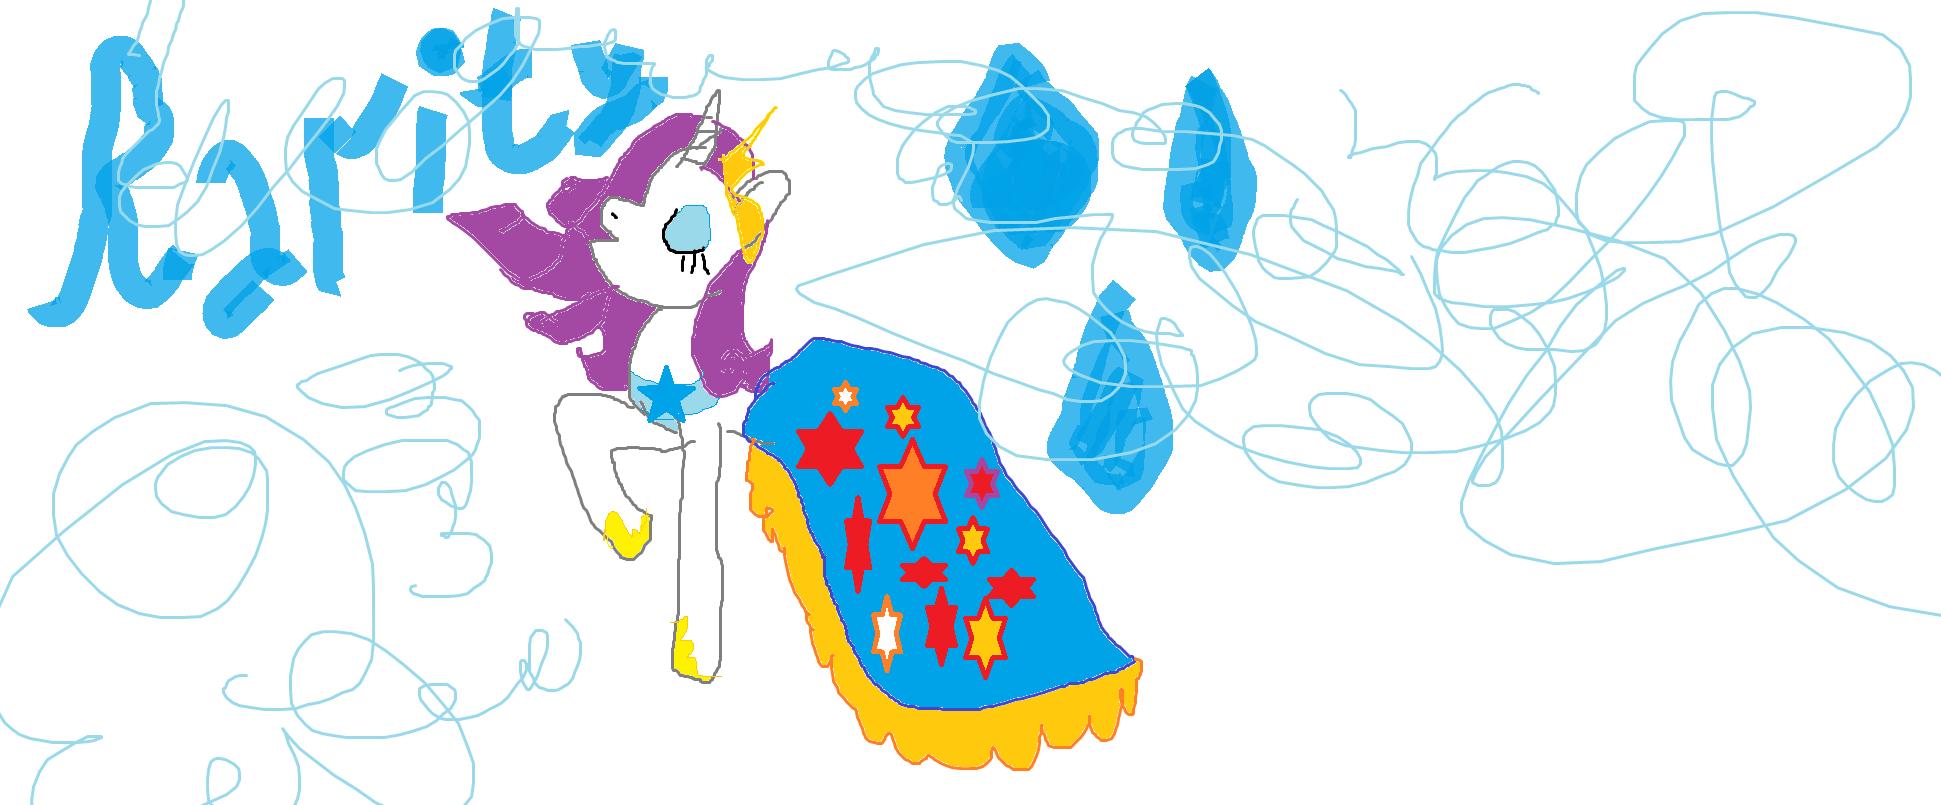 картинки принцессы рарити